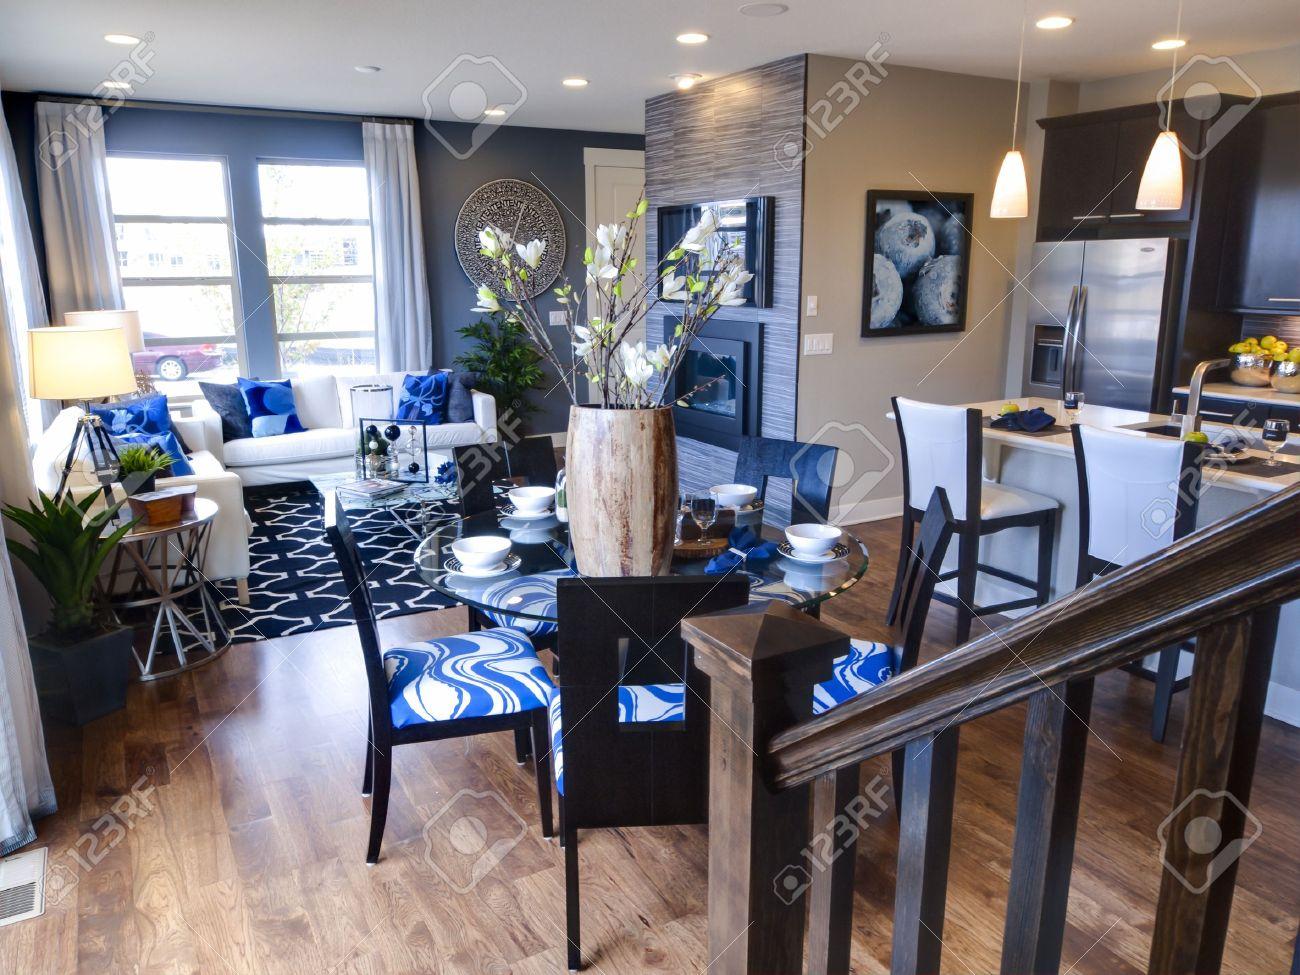 Sedie Sala Da Pranzo Moderne : Sedie per sala pranzo. sedie sala da pranzo moderne set sedie